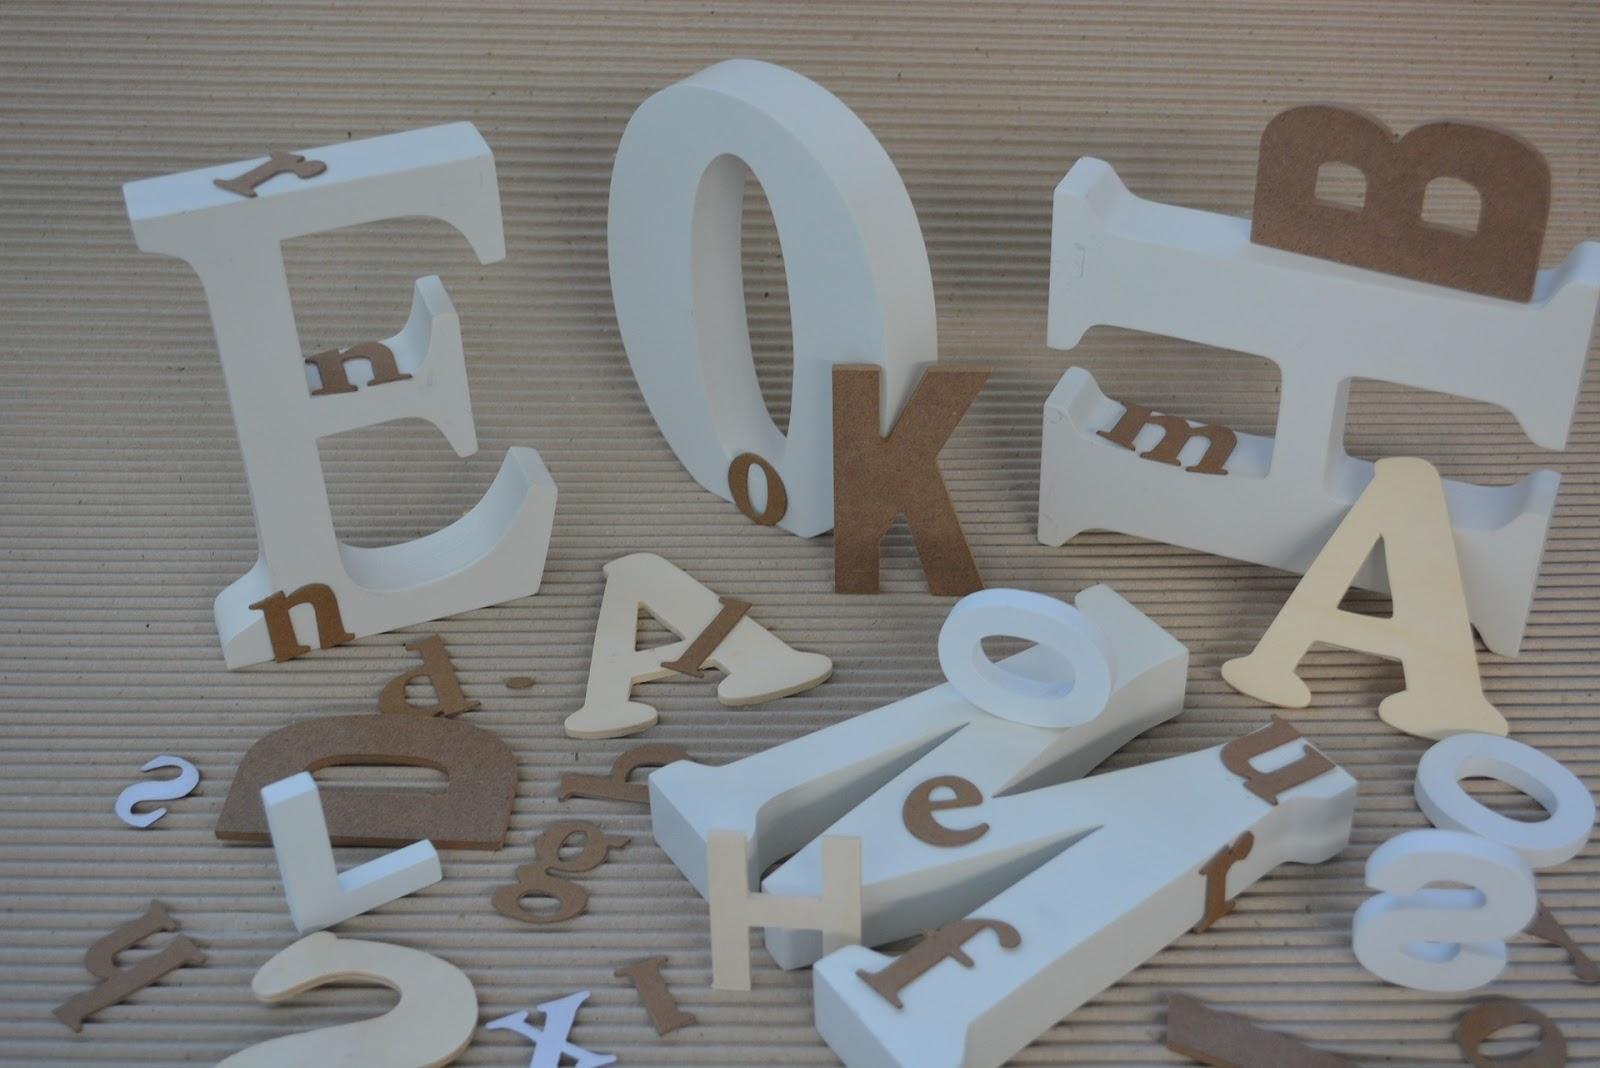 Decoracion Letras Carton ~ decoracion con letras carton